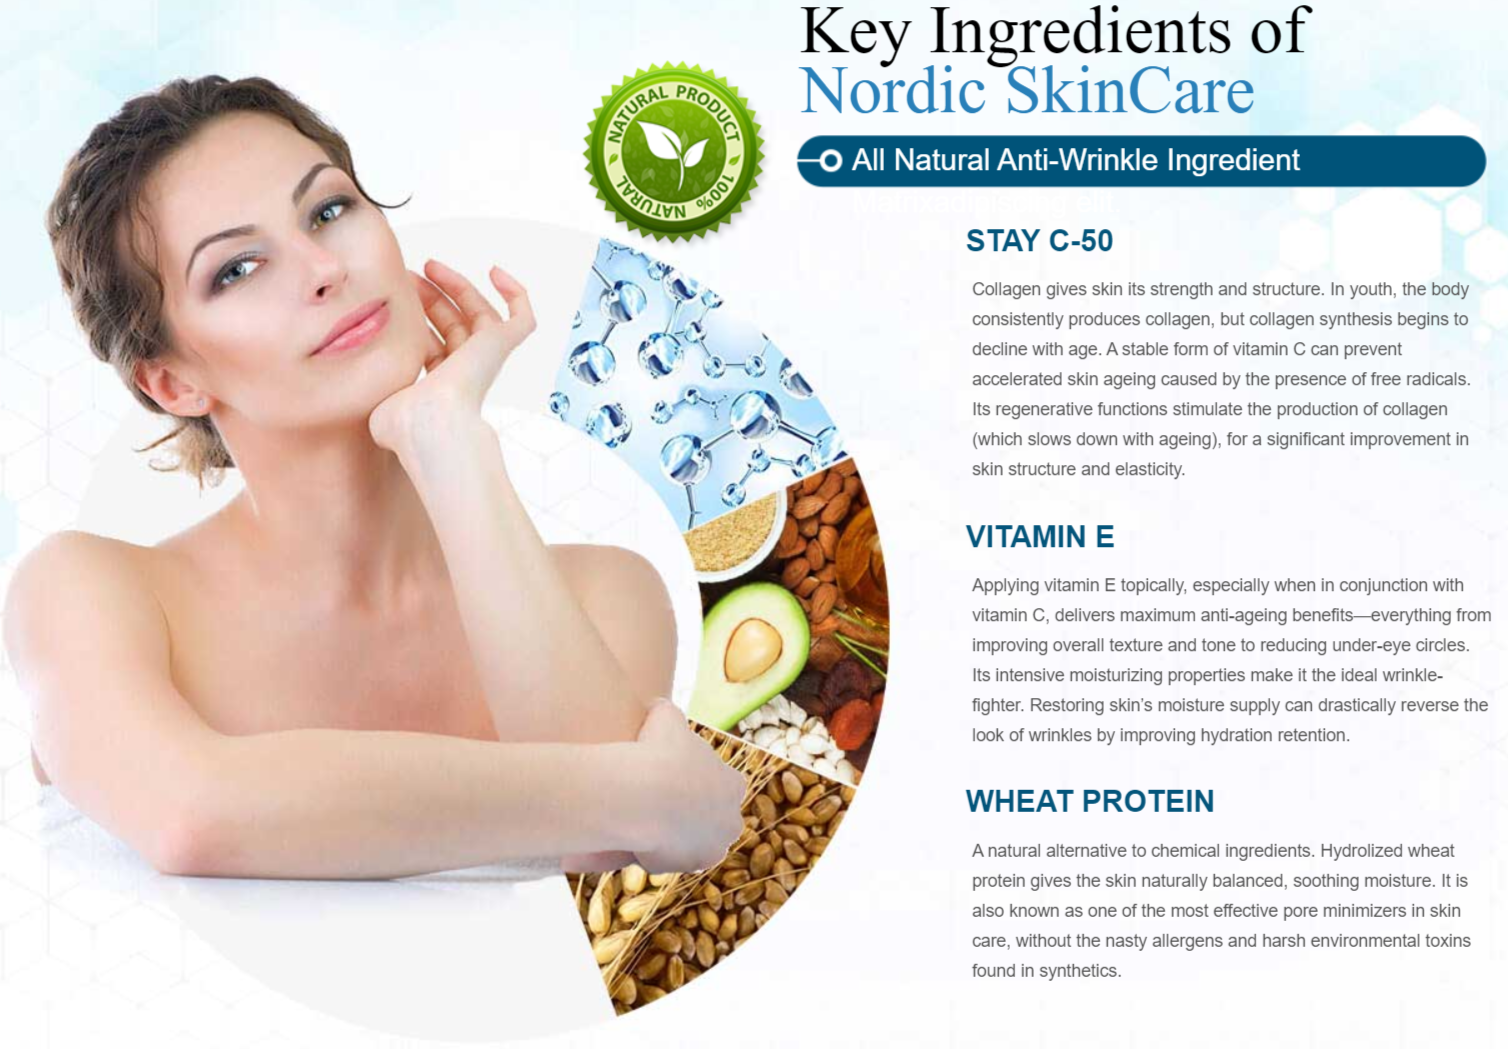 Nordic Skincare Ingredients Label